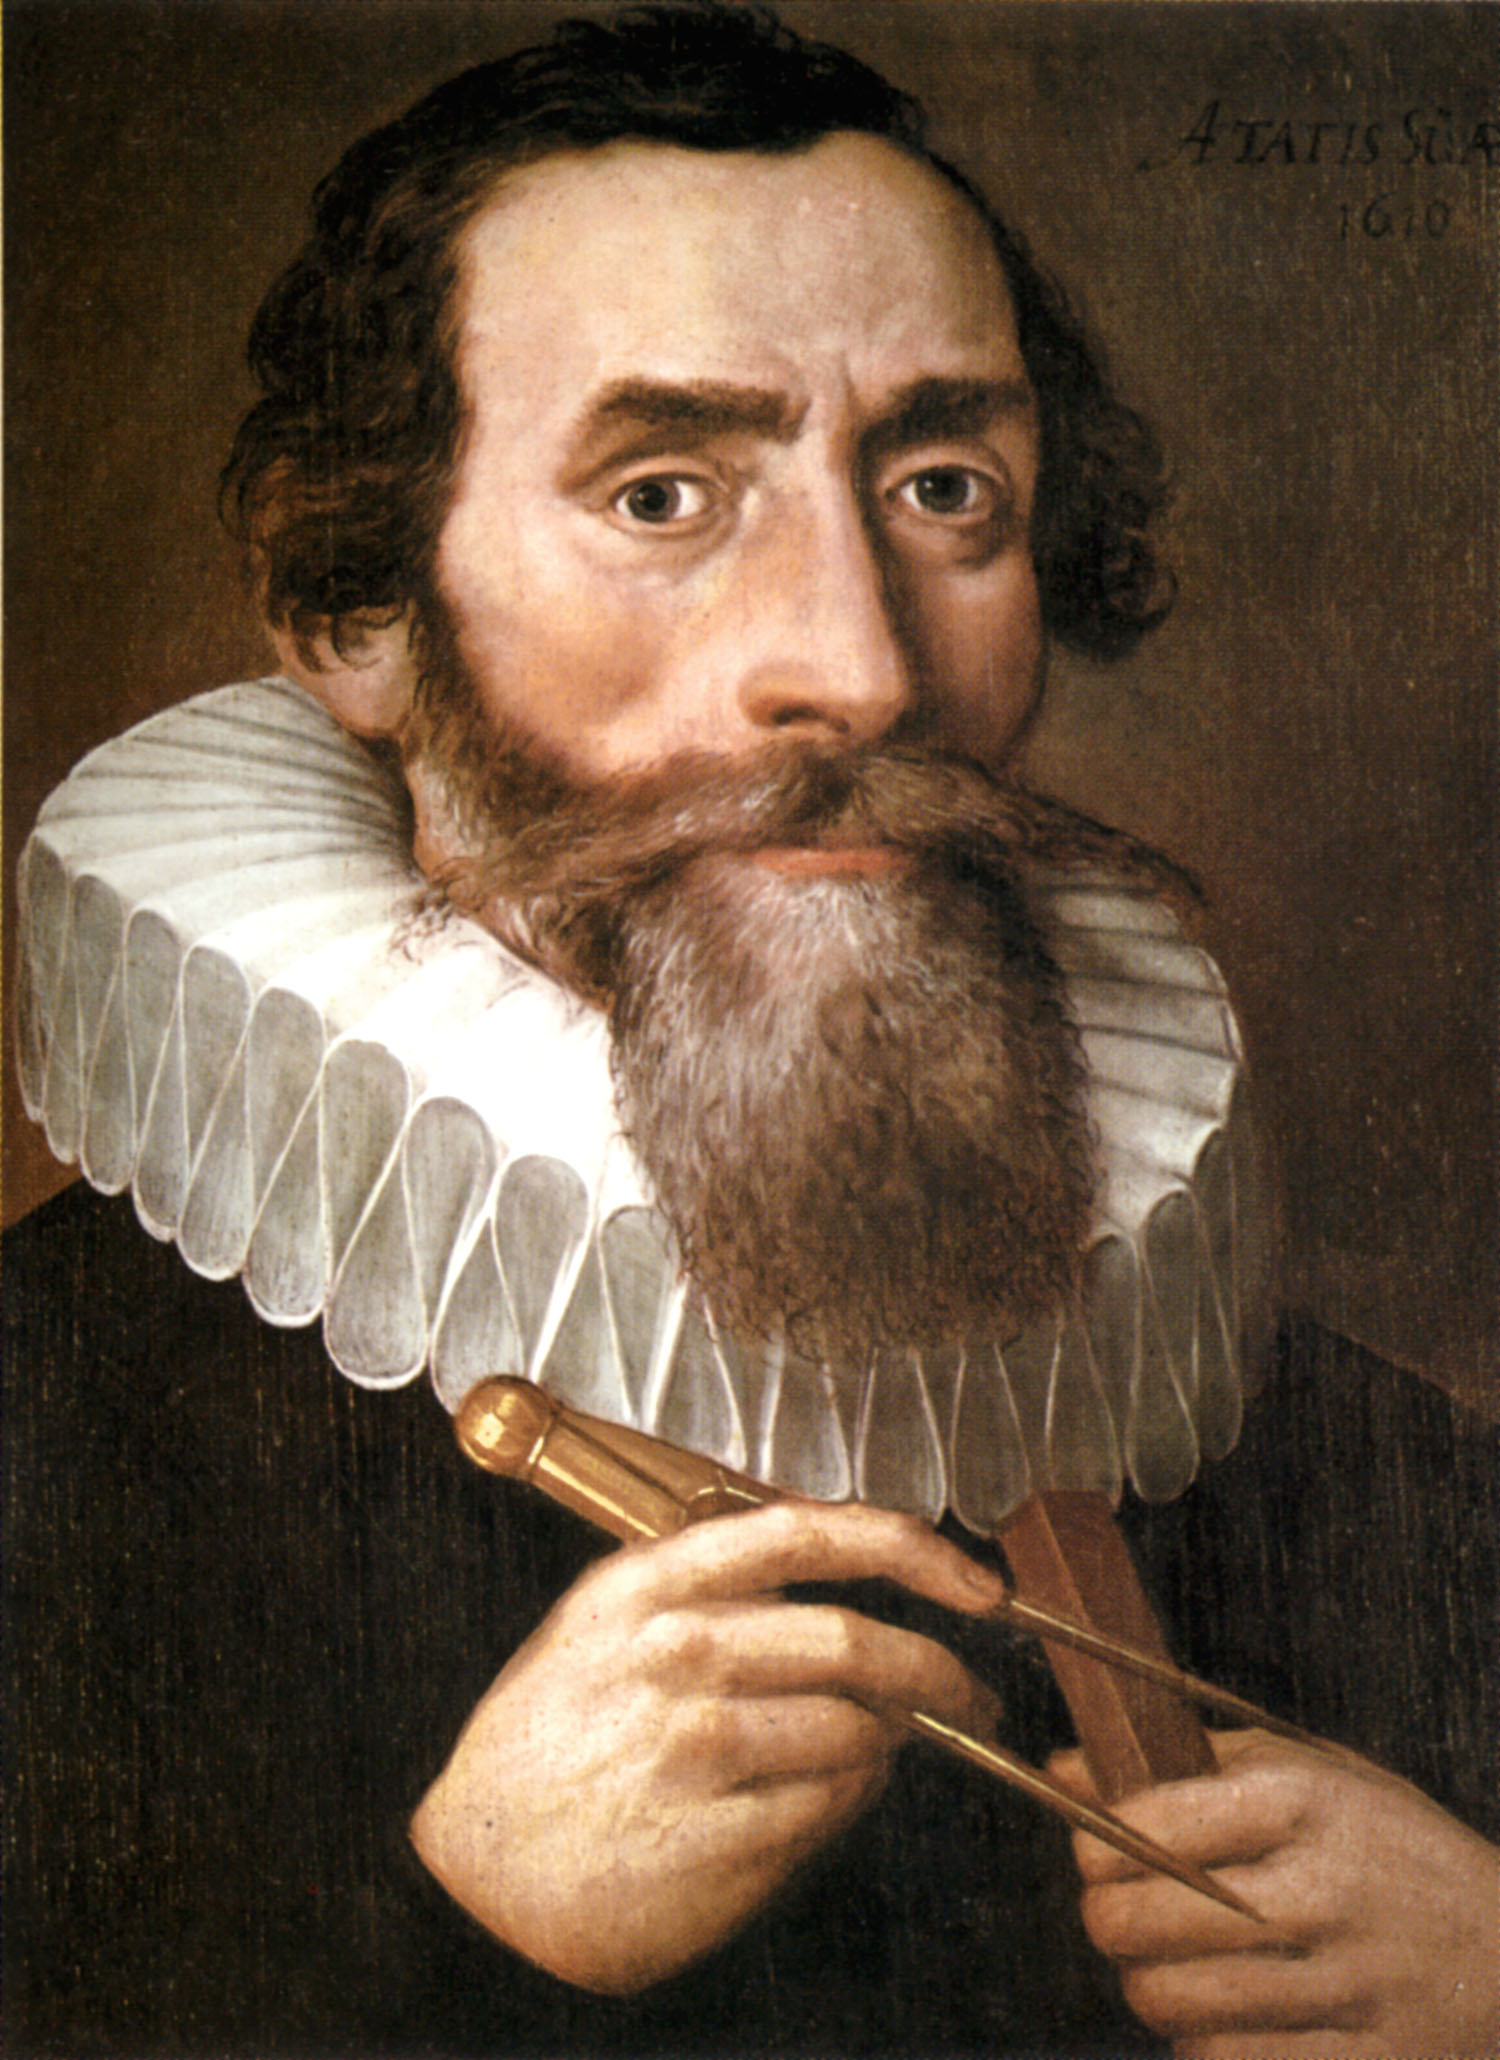 Johannes Kepler (1571-1630), German mathematician, astronomer and astrologer